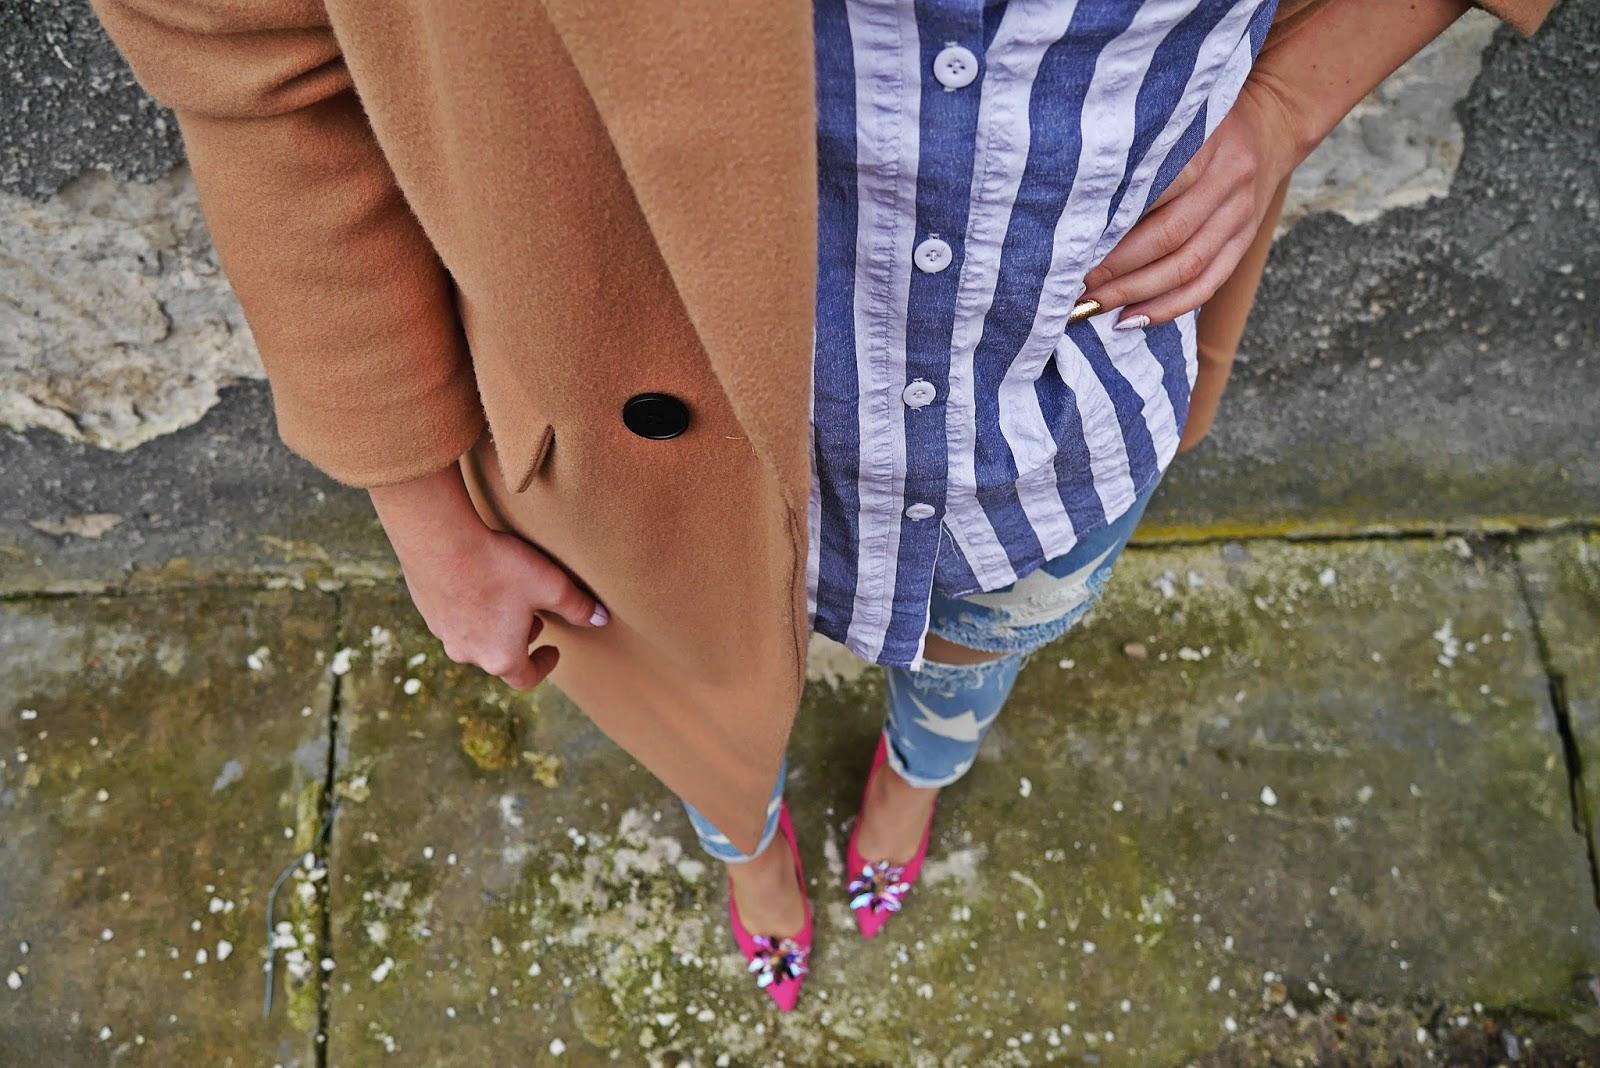 4_pink_heels_renee_baige_coat_stars_jeans_stripes_shirt_karyn_blog_modowy_040218a